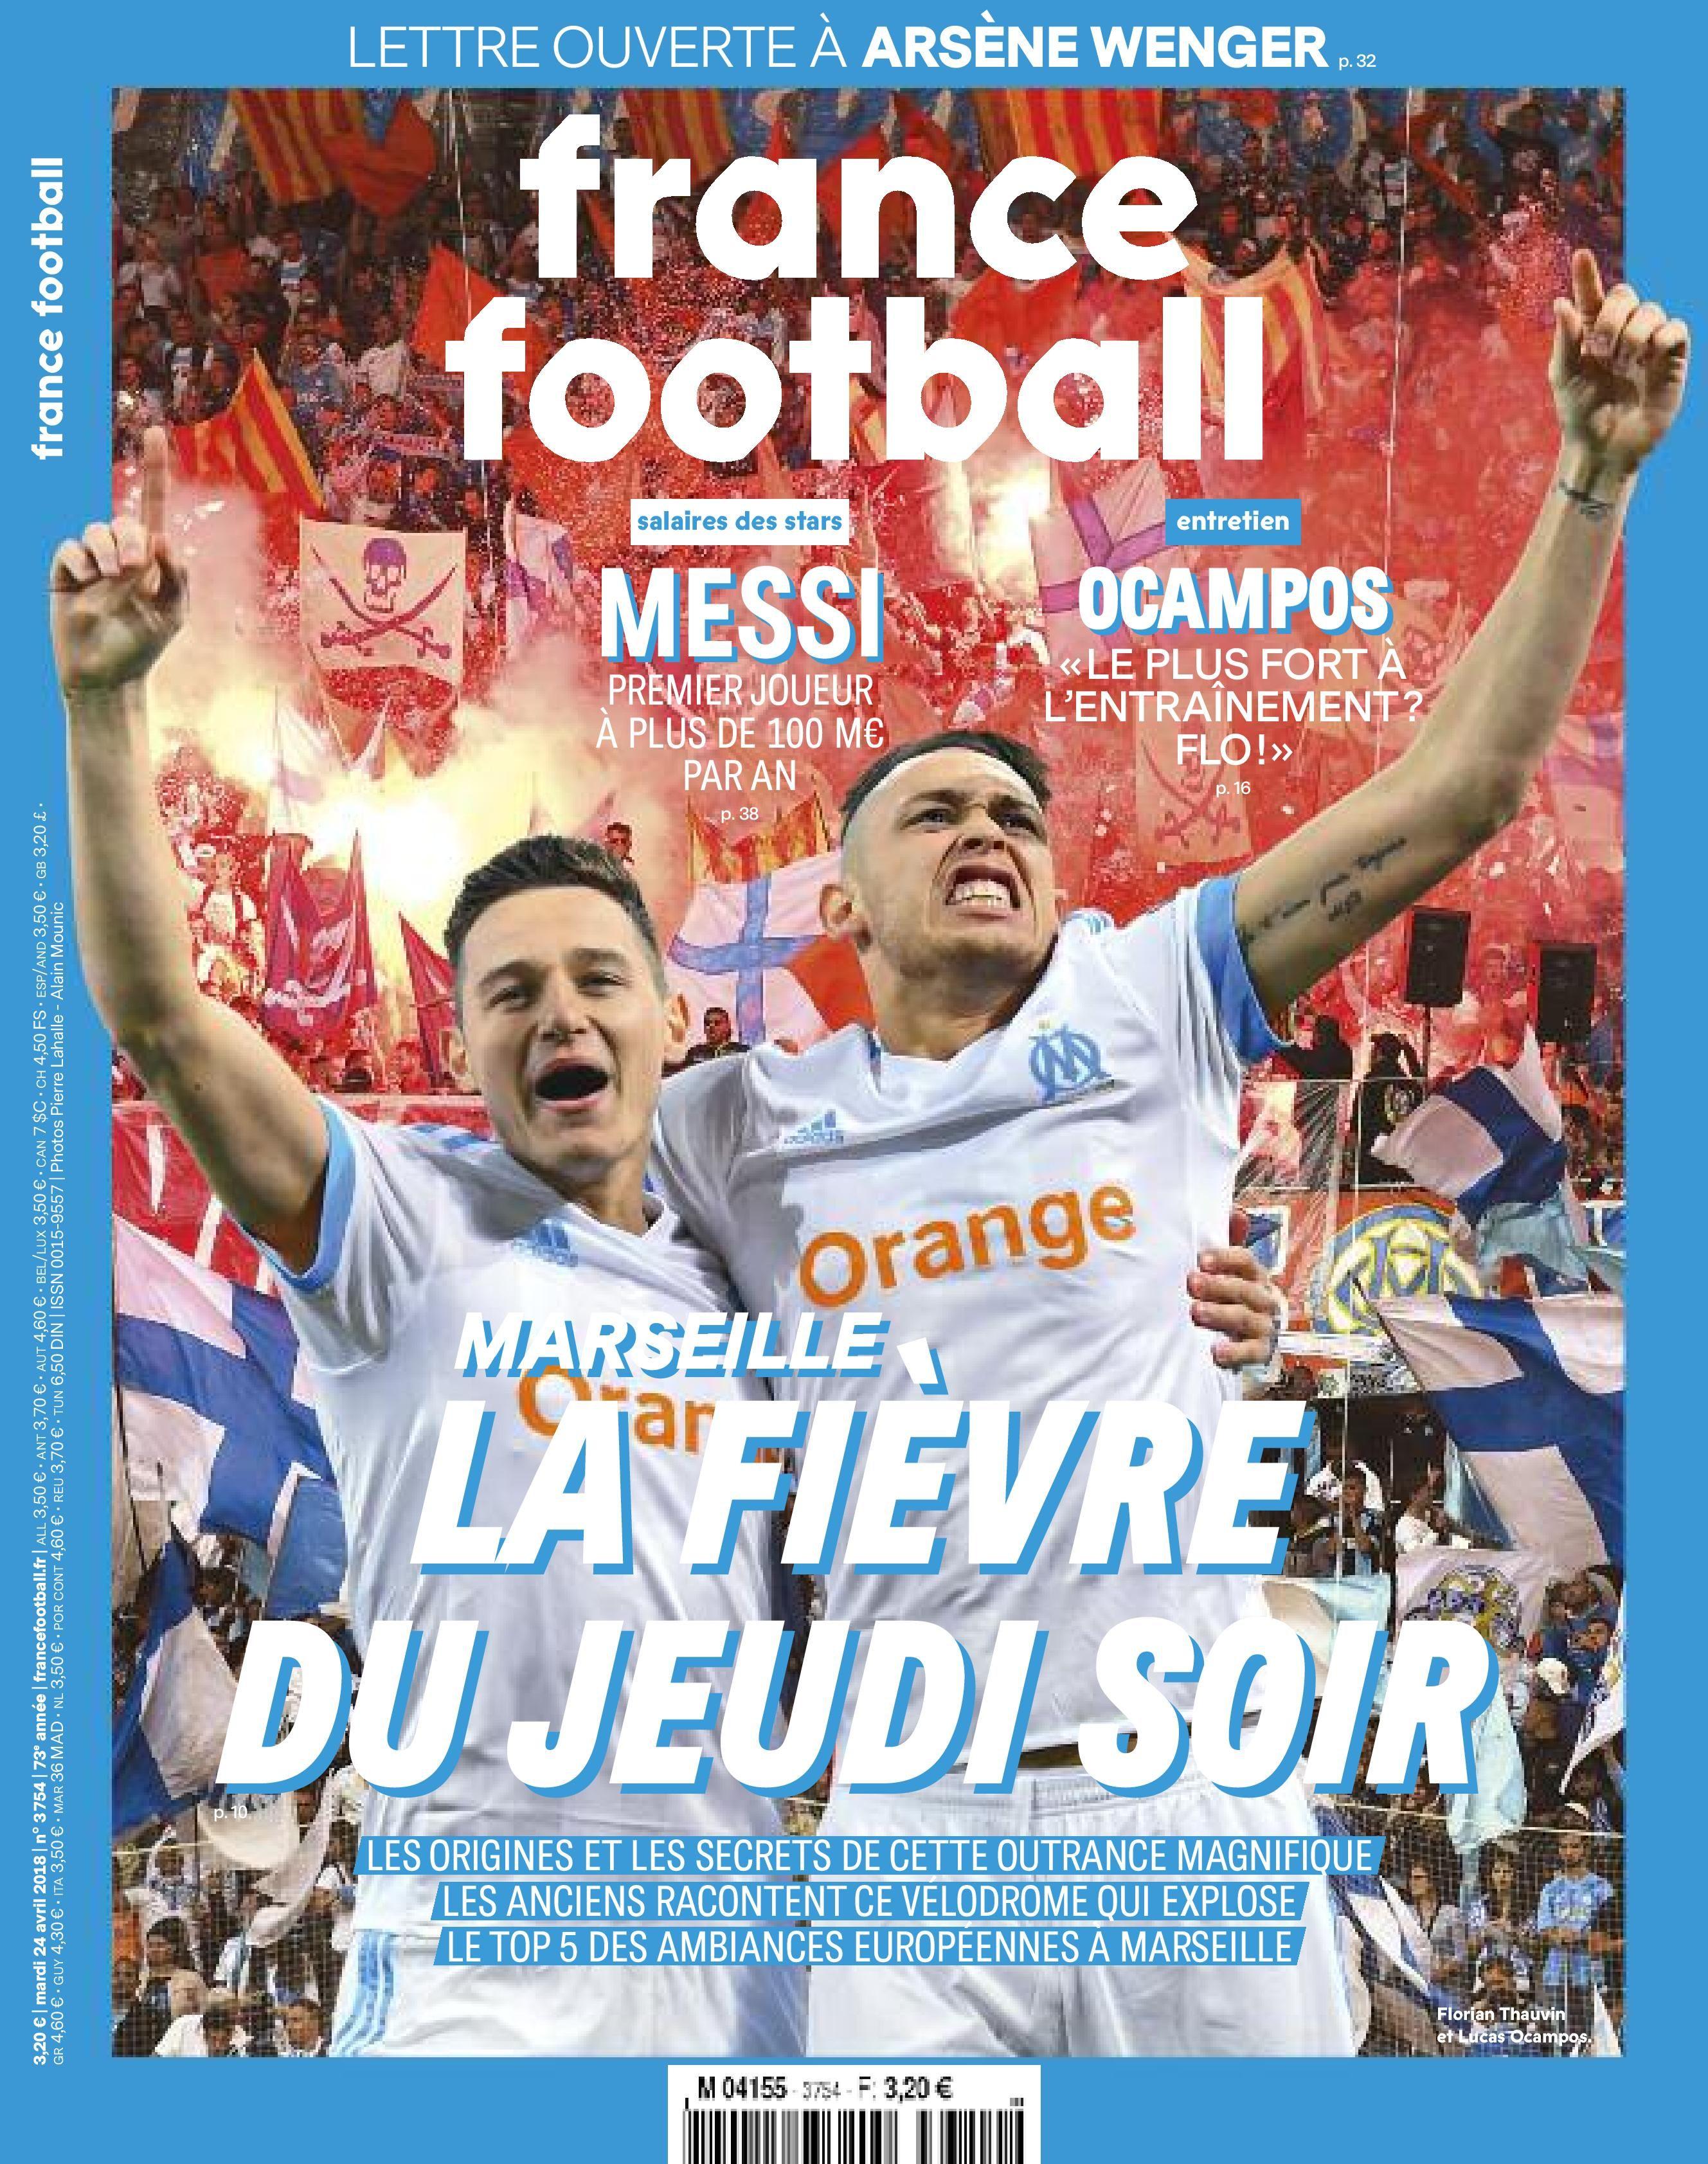 L'OM fada d'Europe à la une de France Football Médias